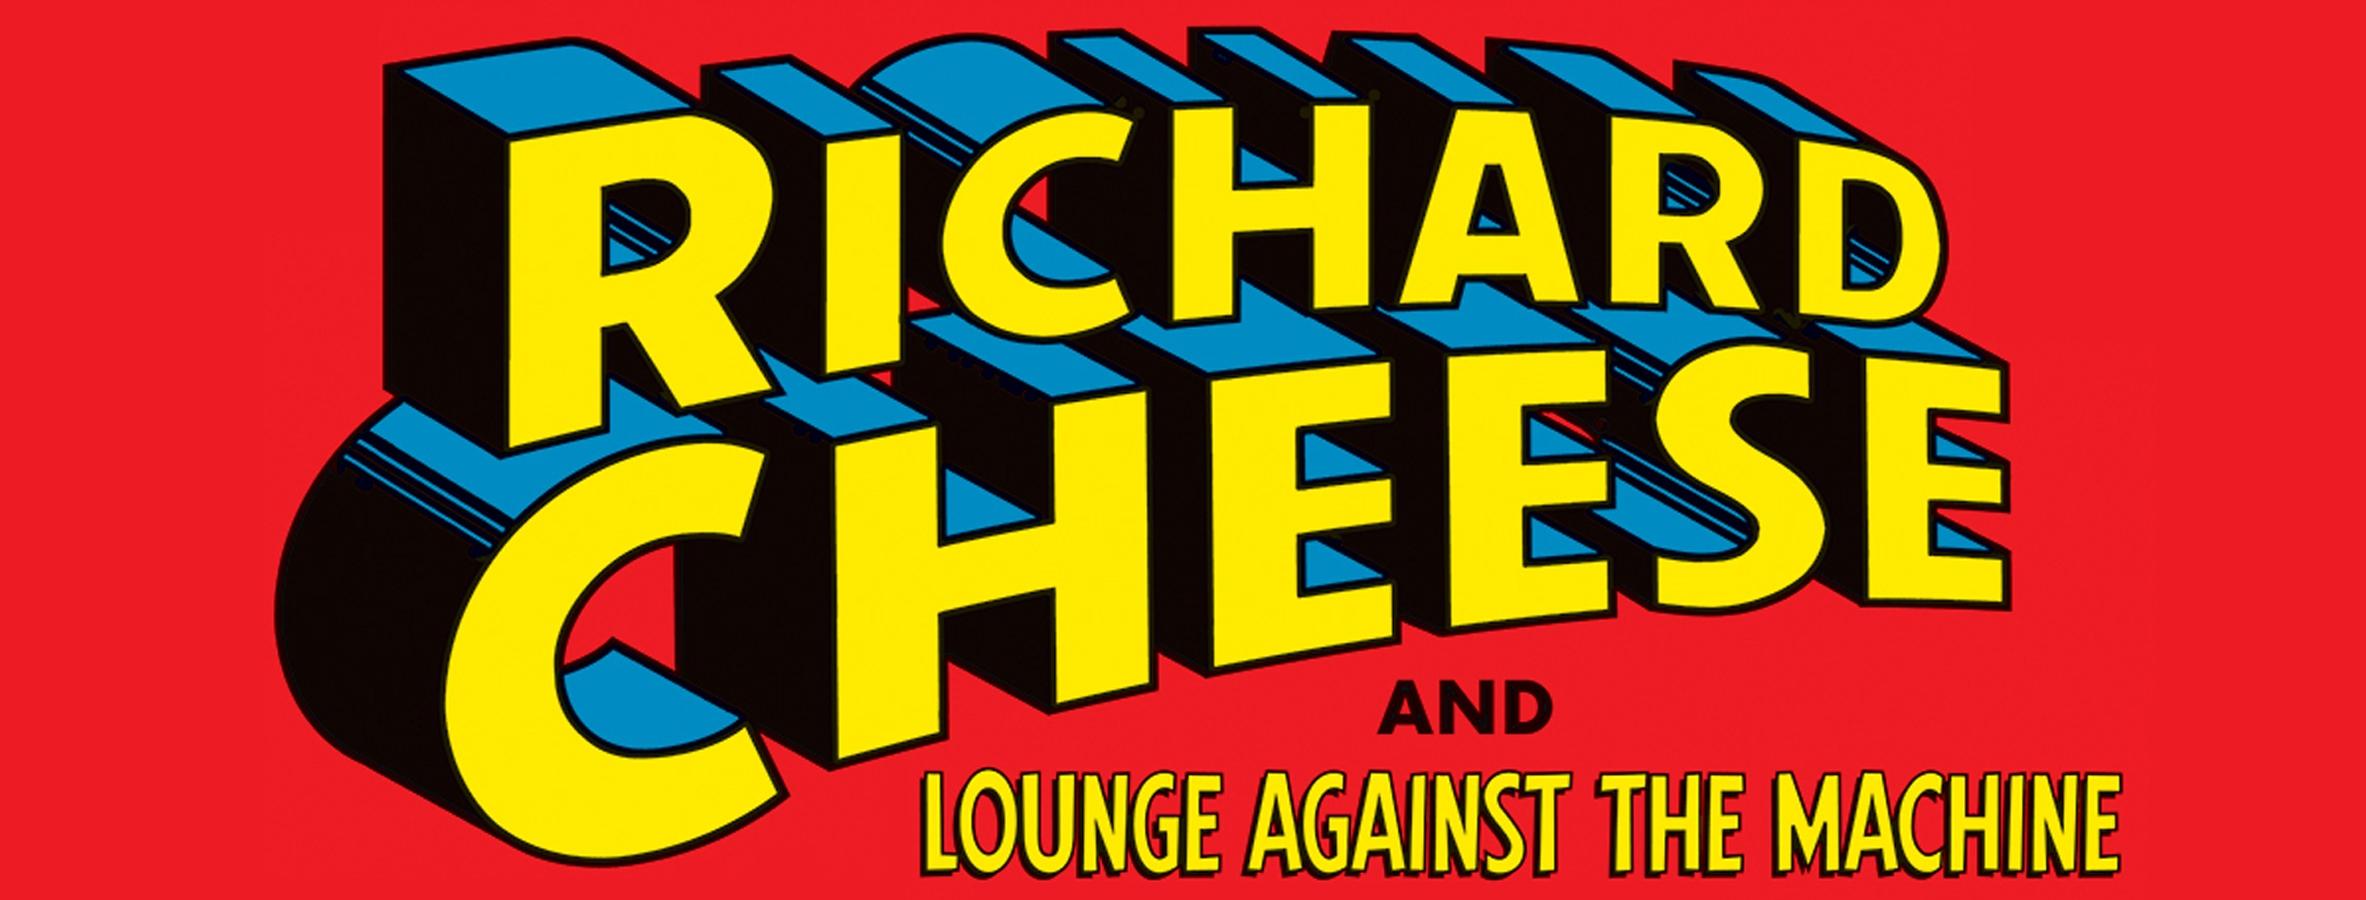 Richard Cheese (@richardcheese) Cover Image